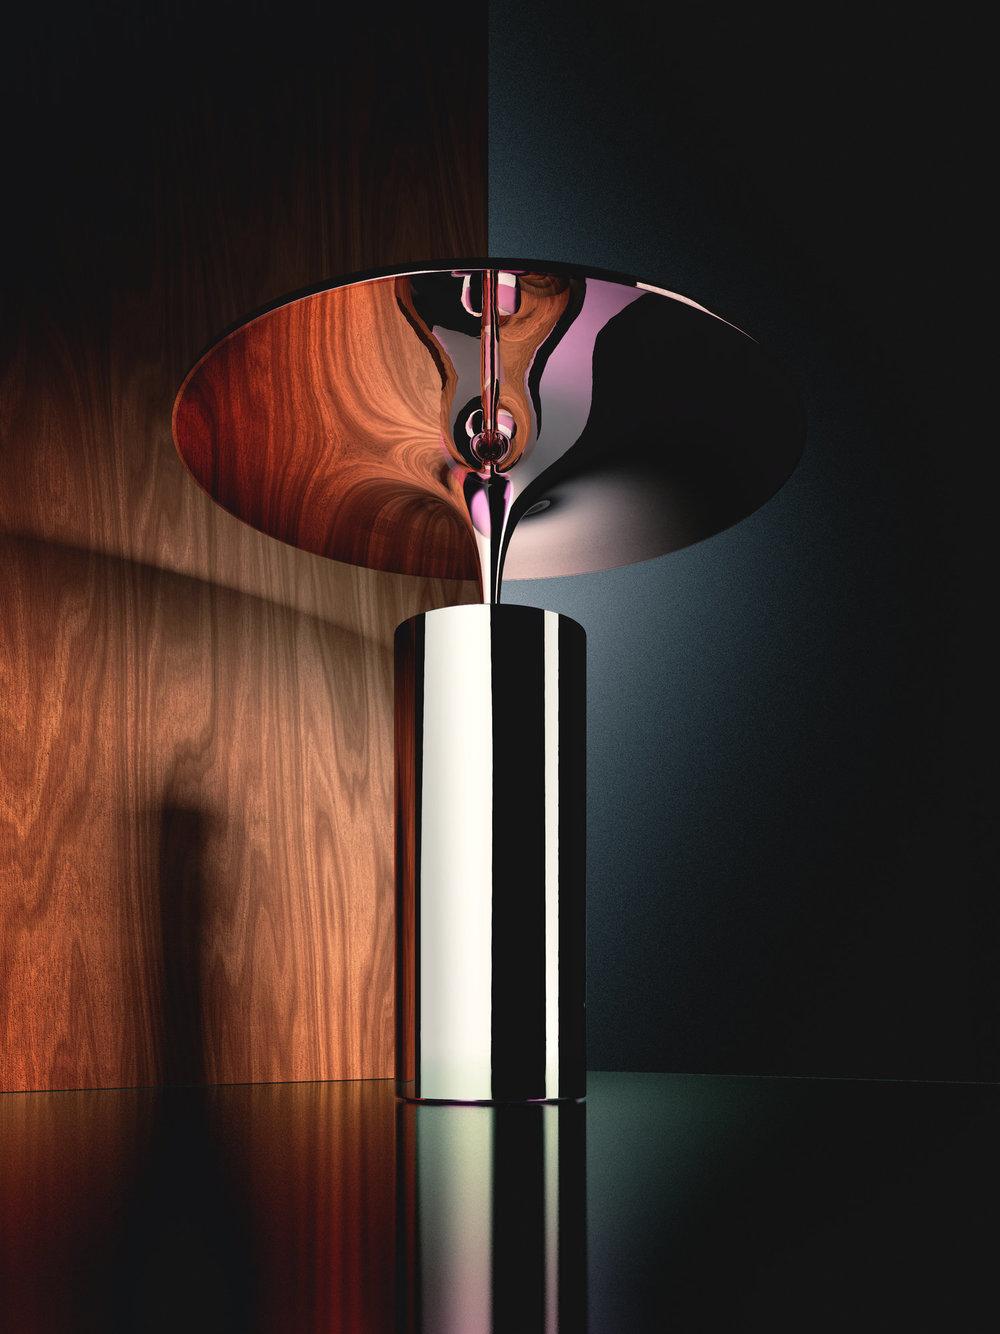 REFLECTION Lamp Design